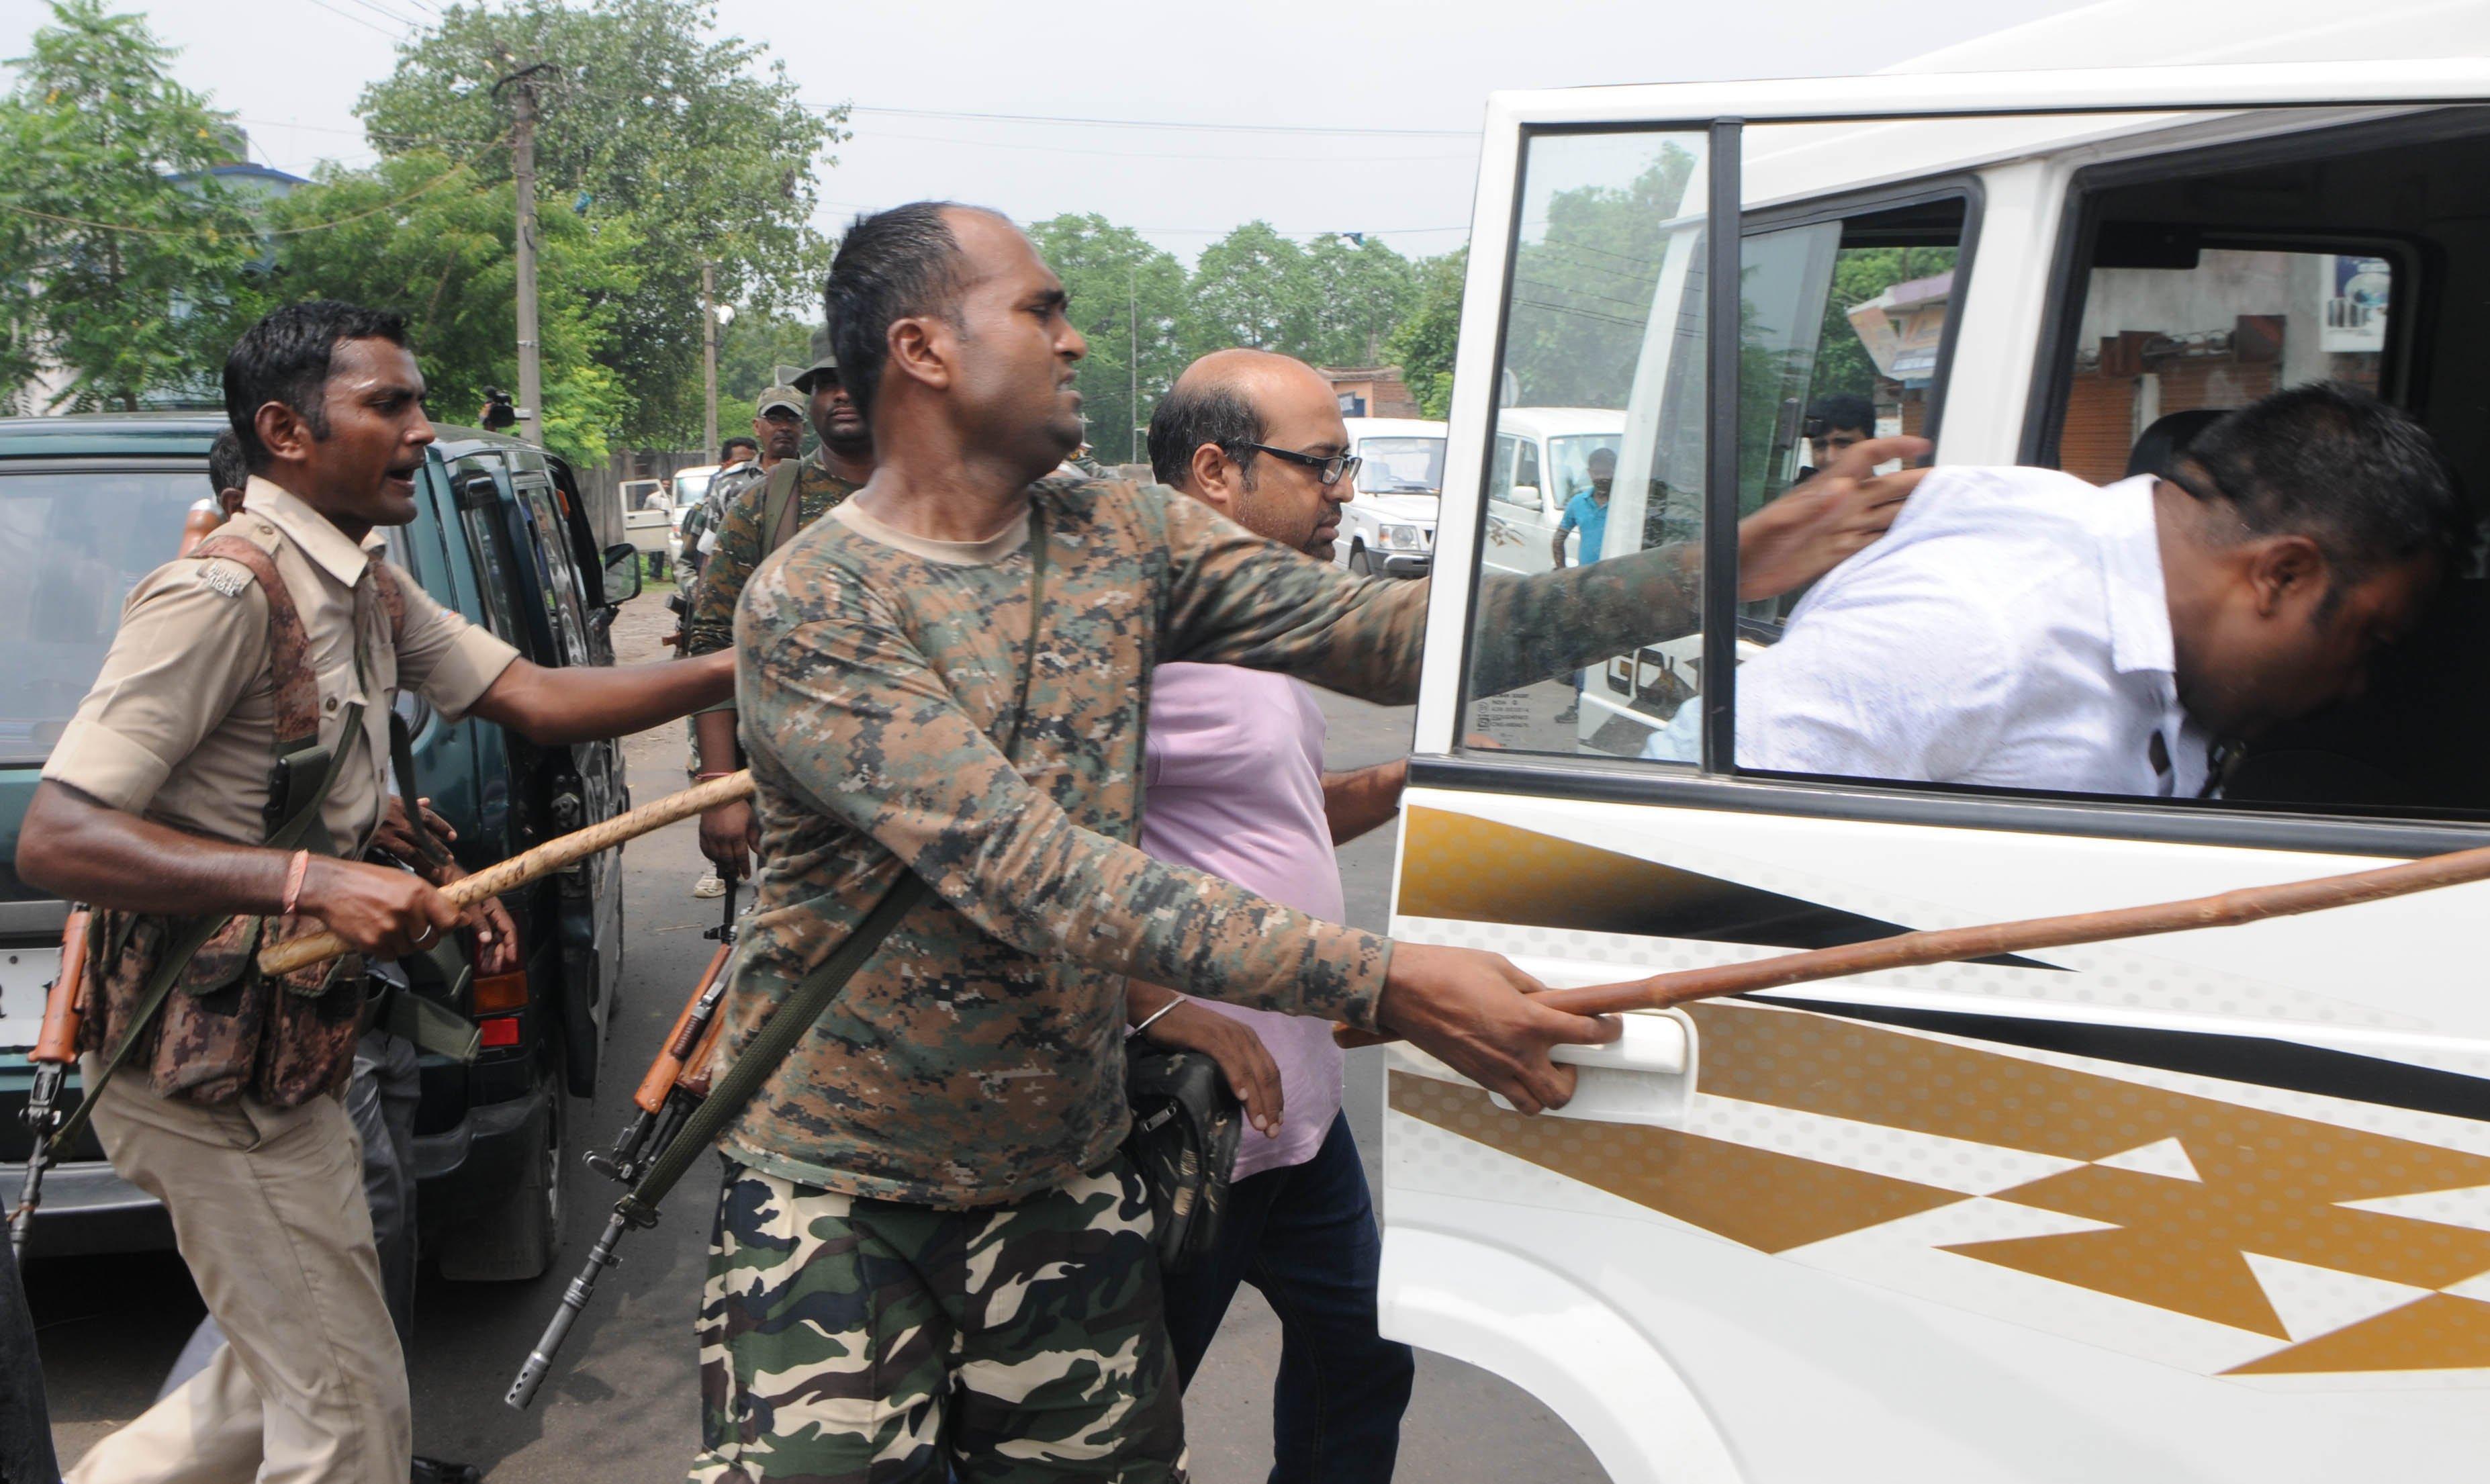 گاؤ ماتا لنچنگ انڈیا مسلمان